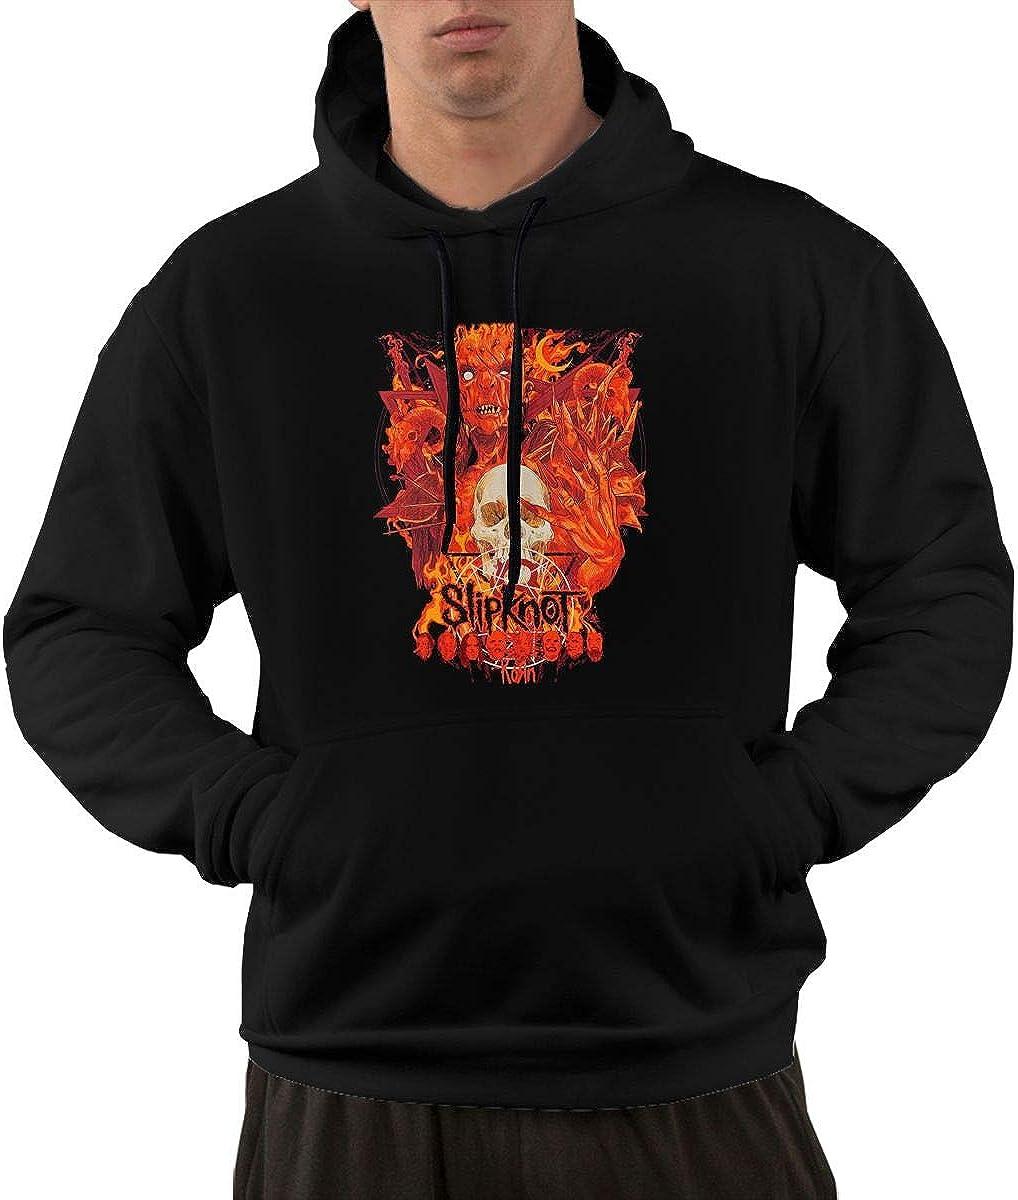 TIANBA Classic Slipknot Devil Hoodies for Mans Black